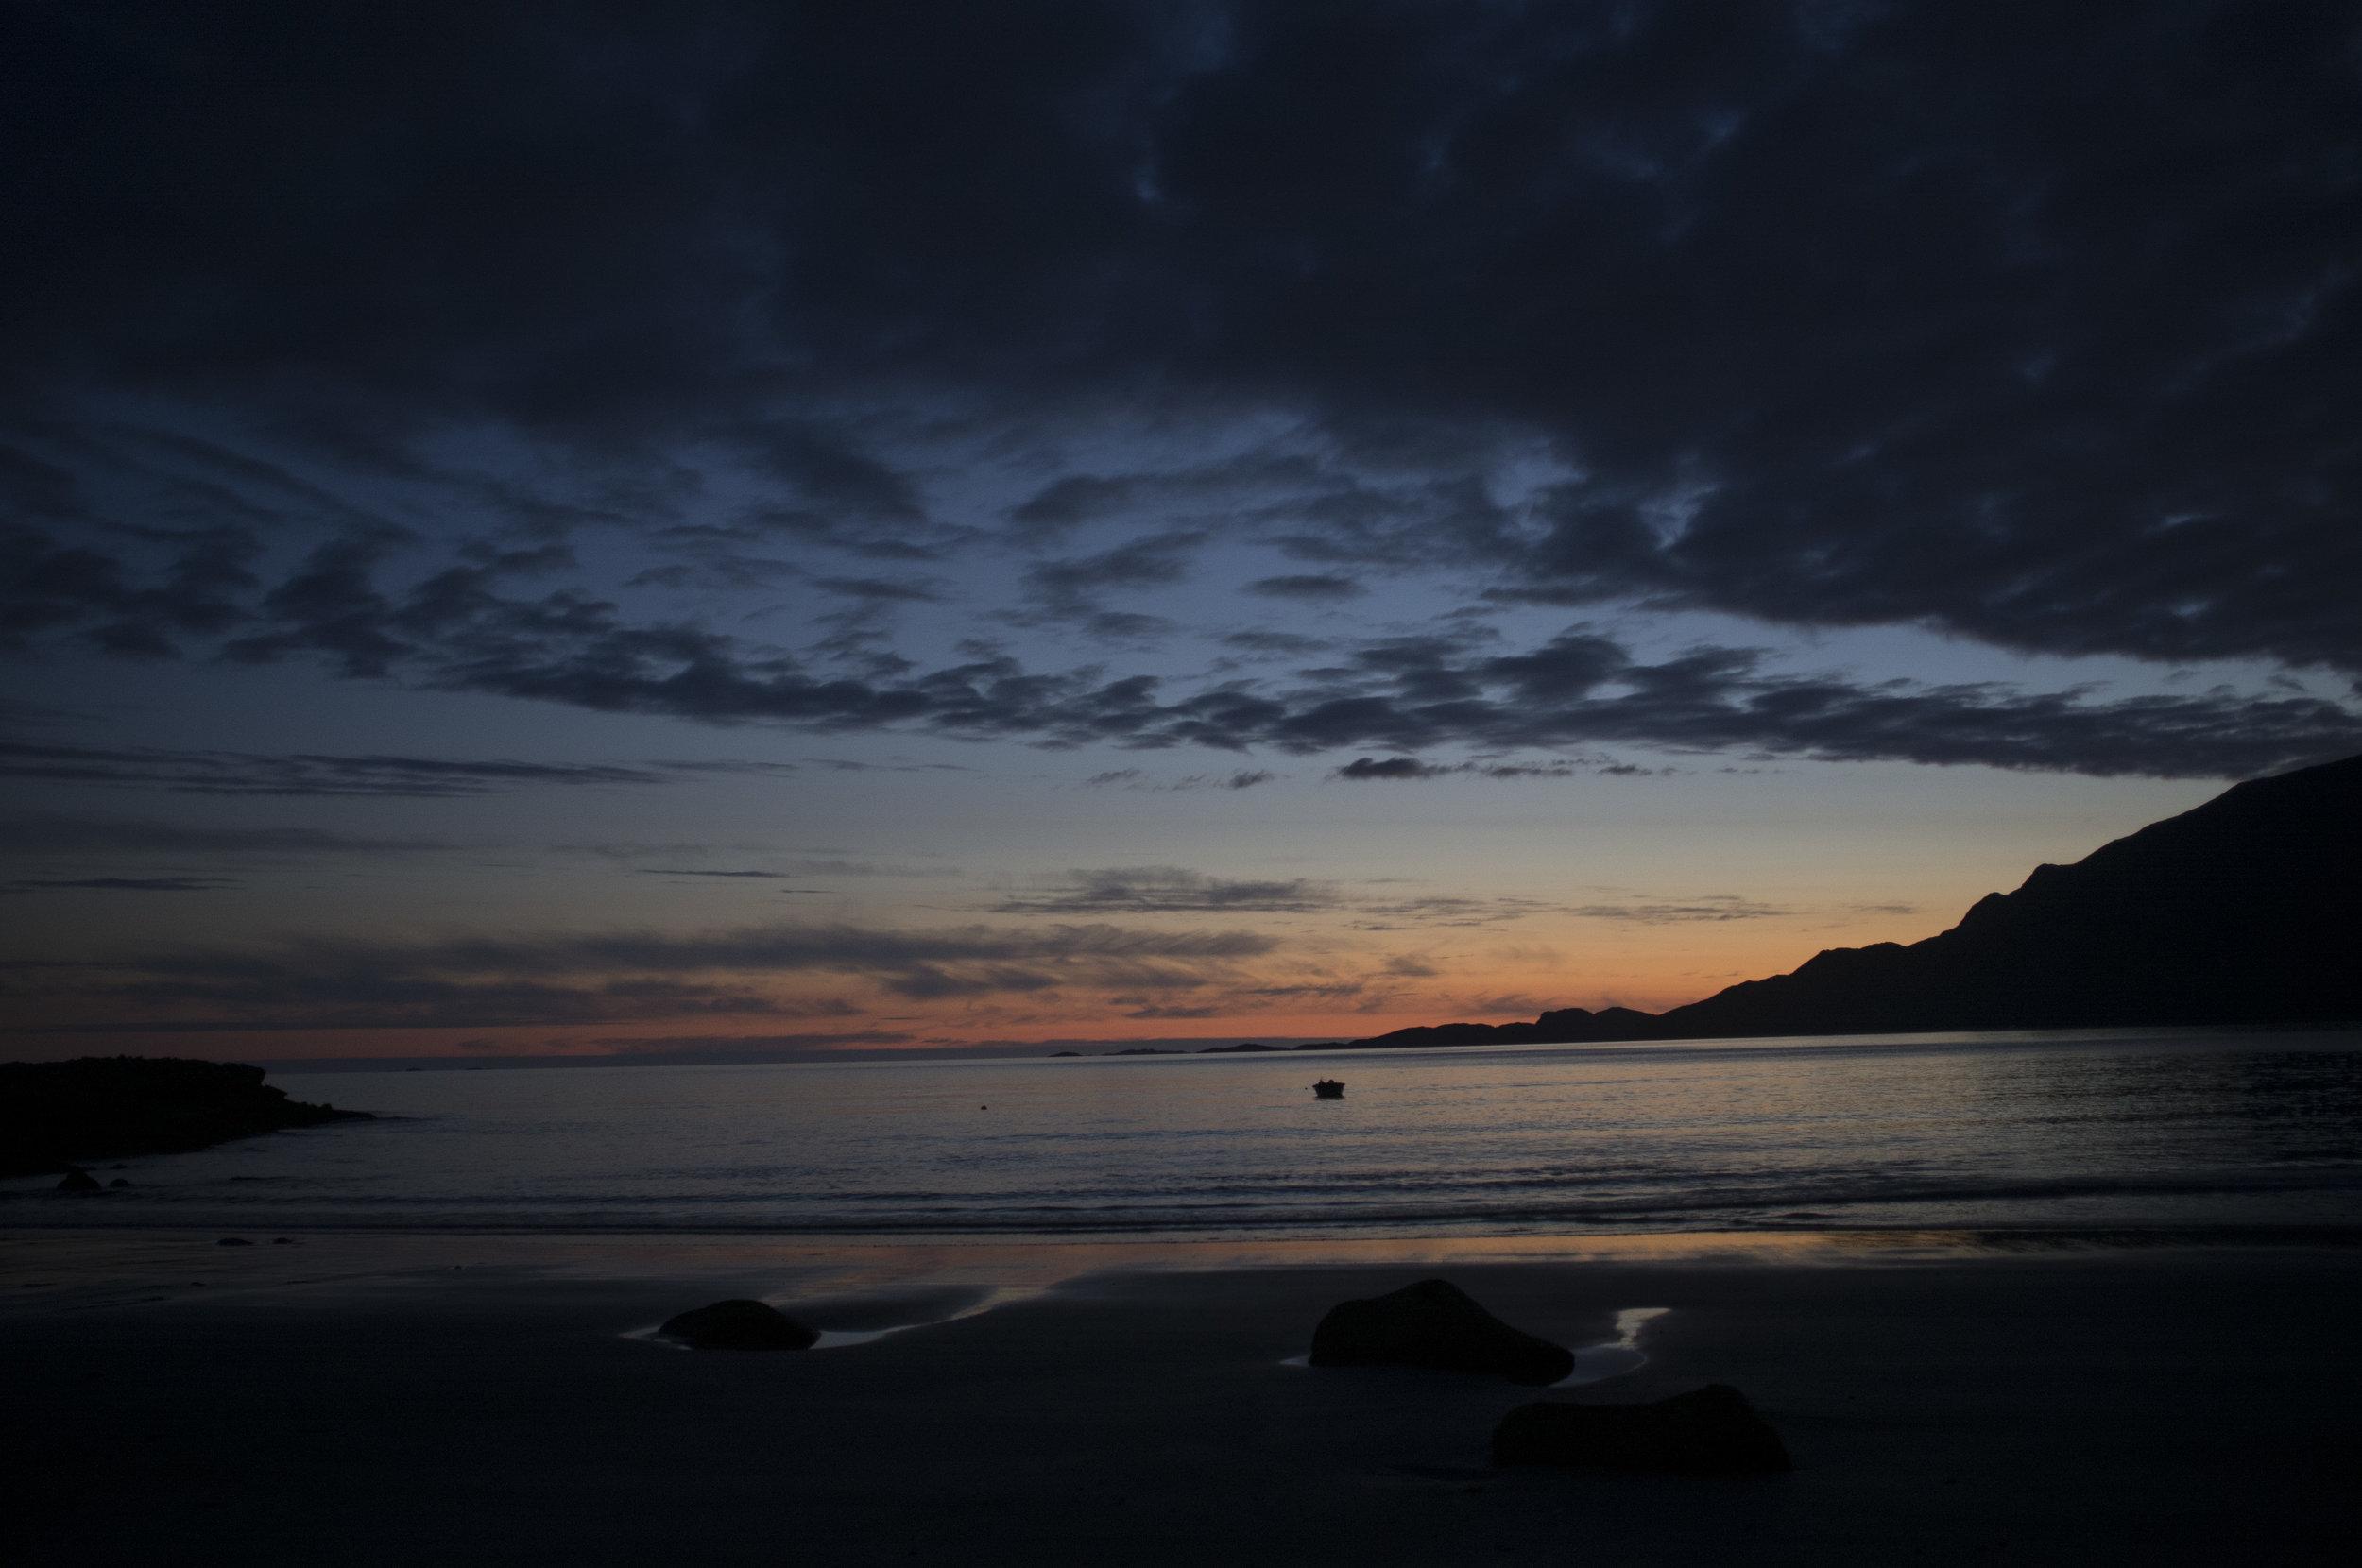 010_Dark sea at Grotfjord_no filter_3.jpg